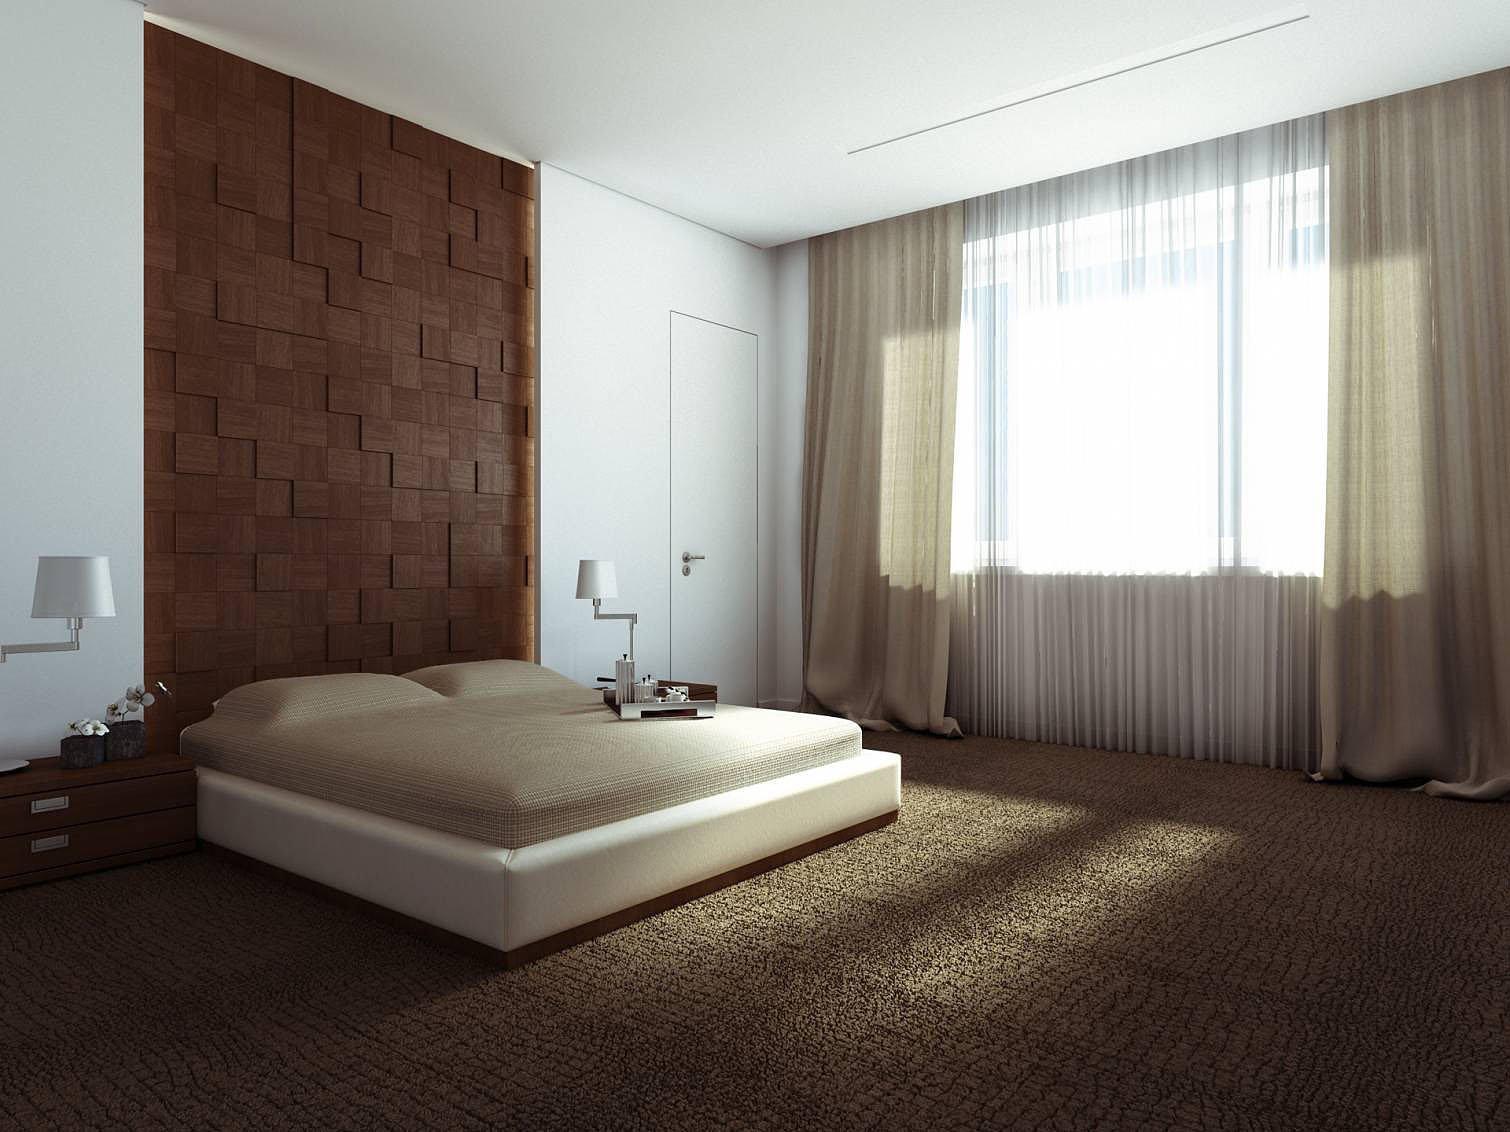 Apartment-Design-in-Moskovyan-Plaza-09